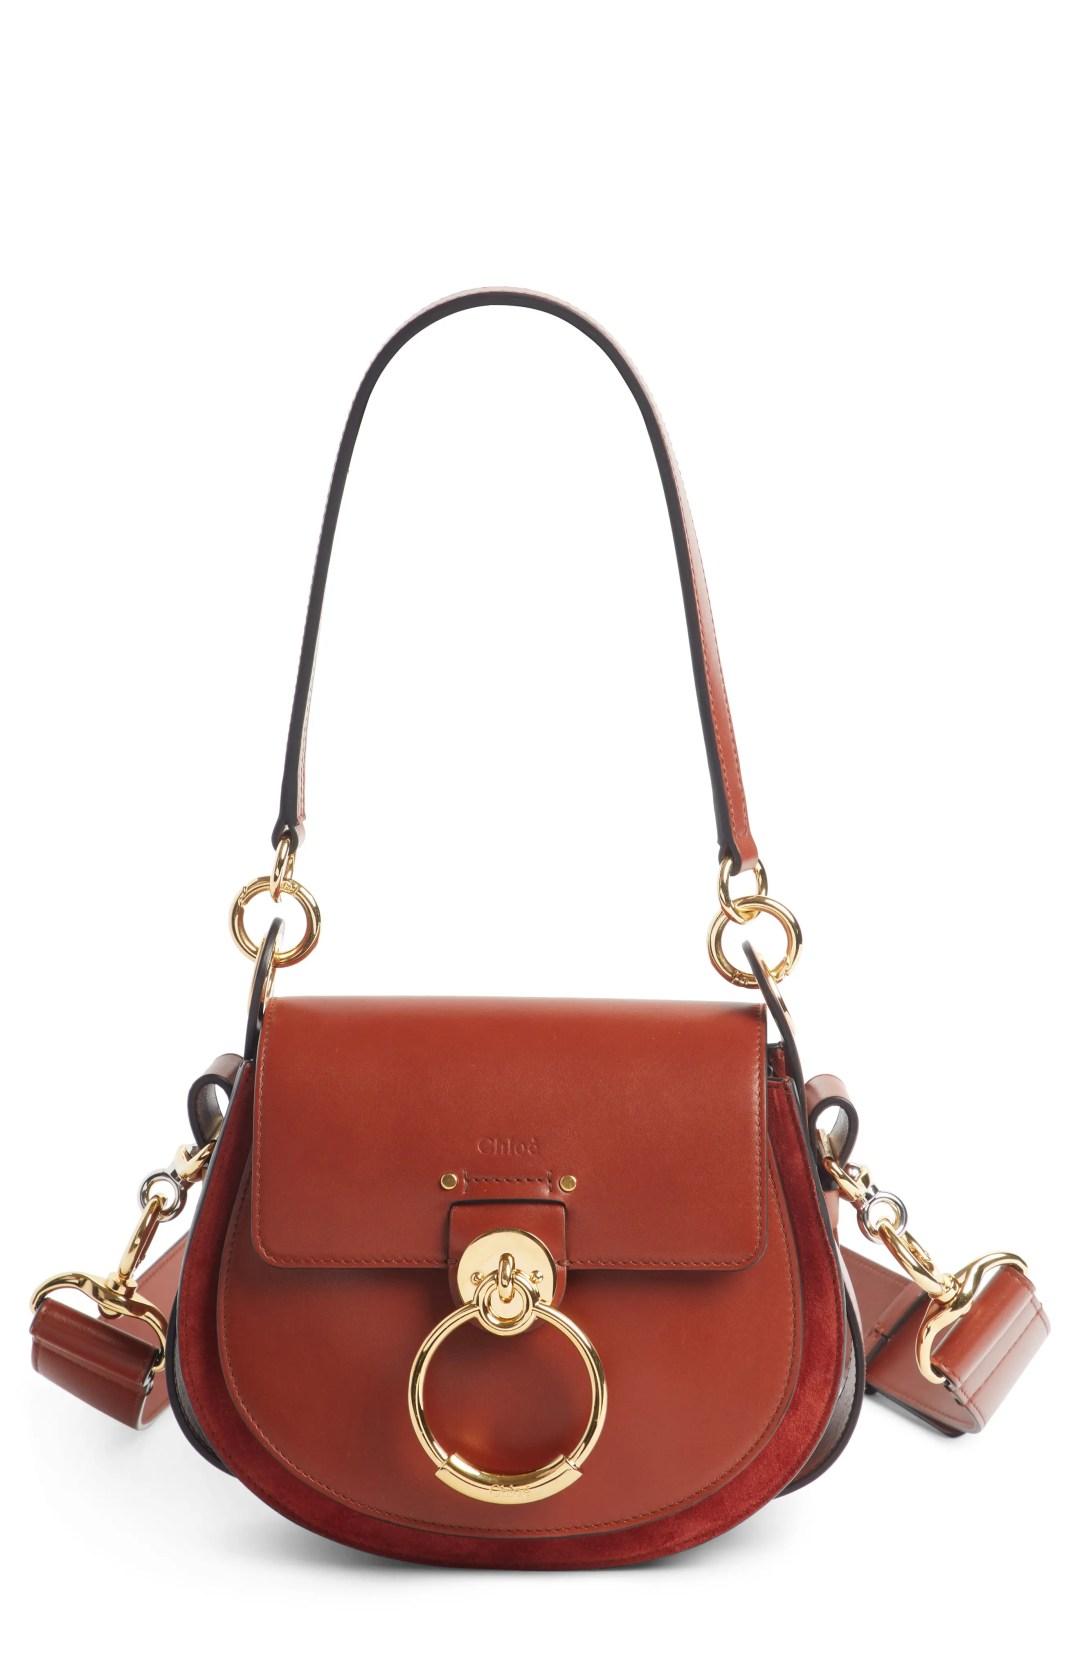 Chloé Small Tess Calfskin Leather Shoulder Bag a858262b8c